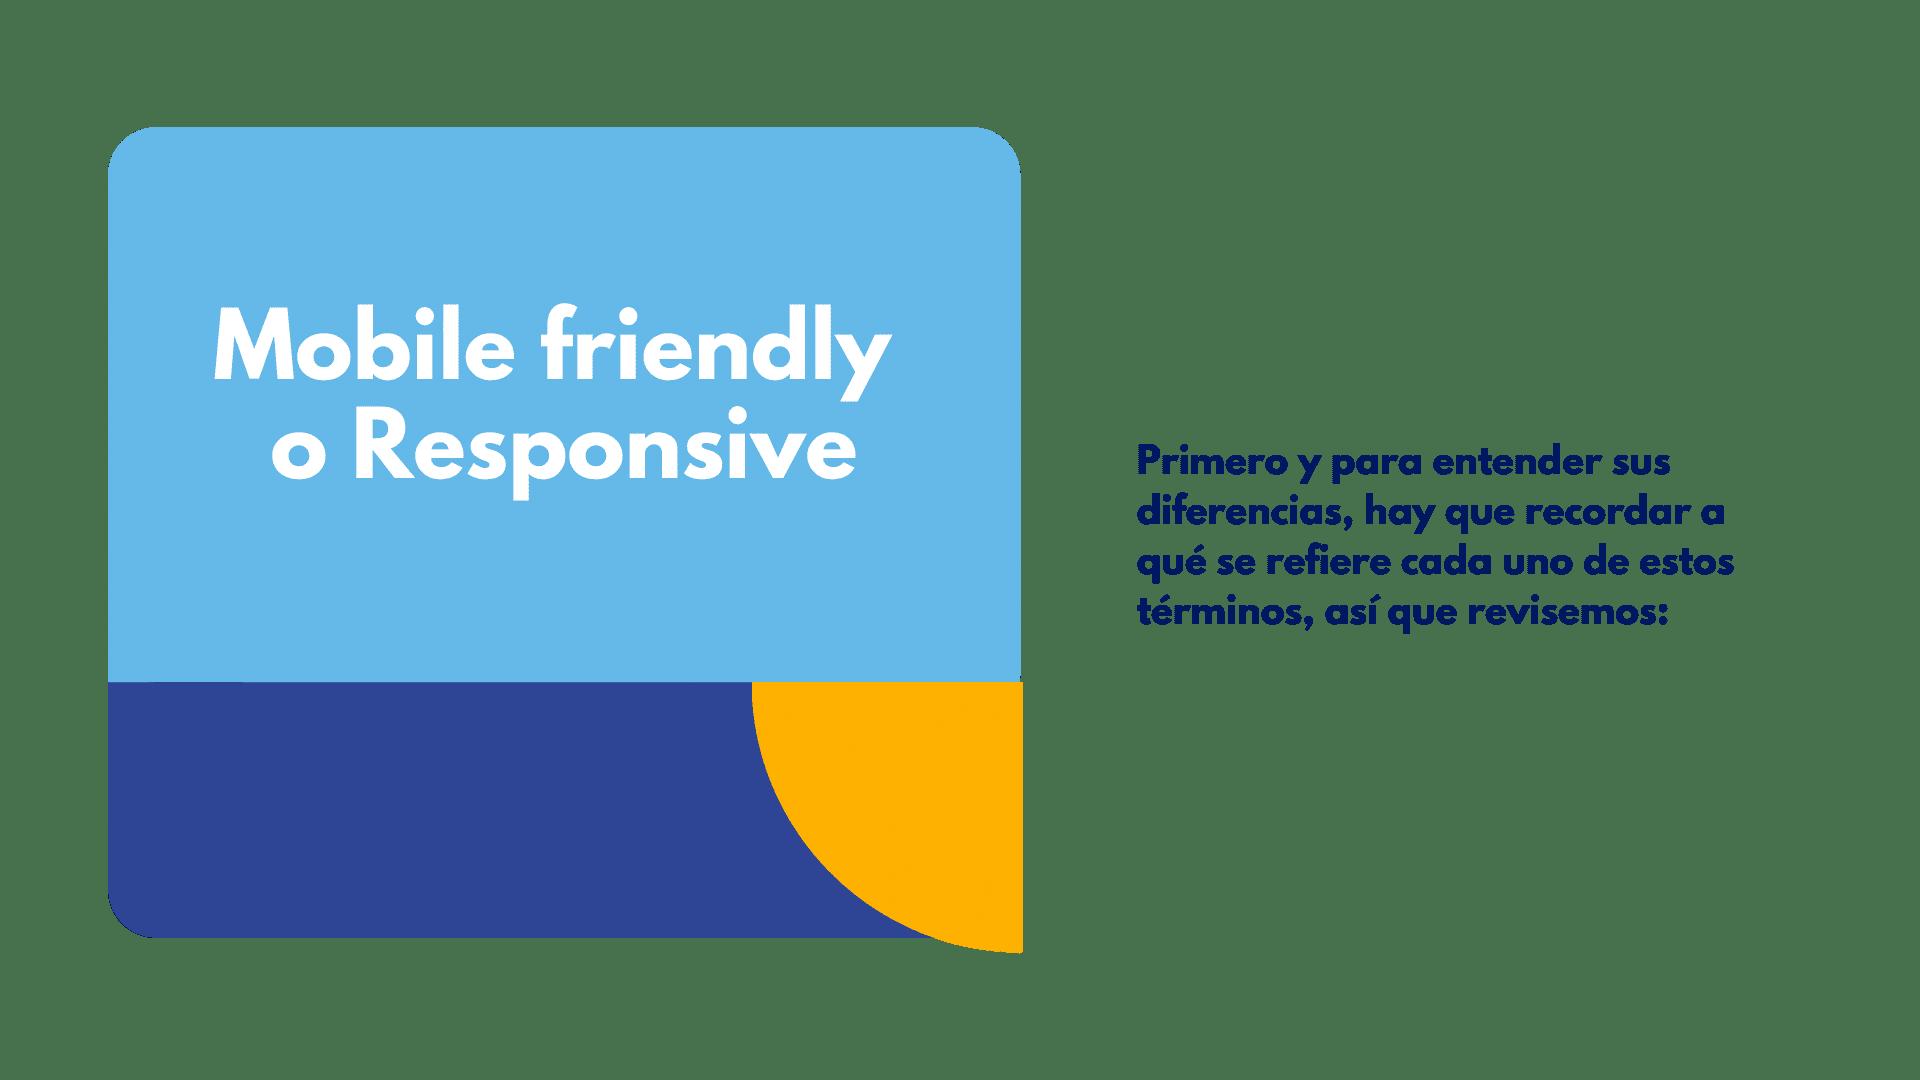 mobile friendly o responsive